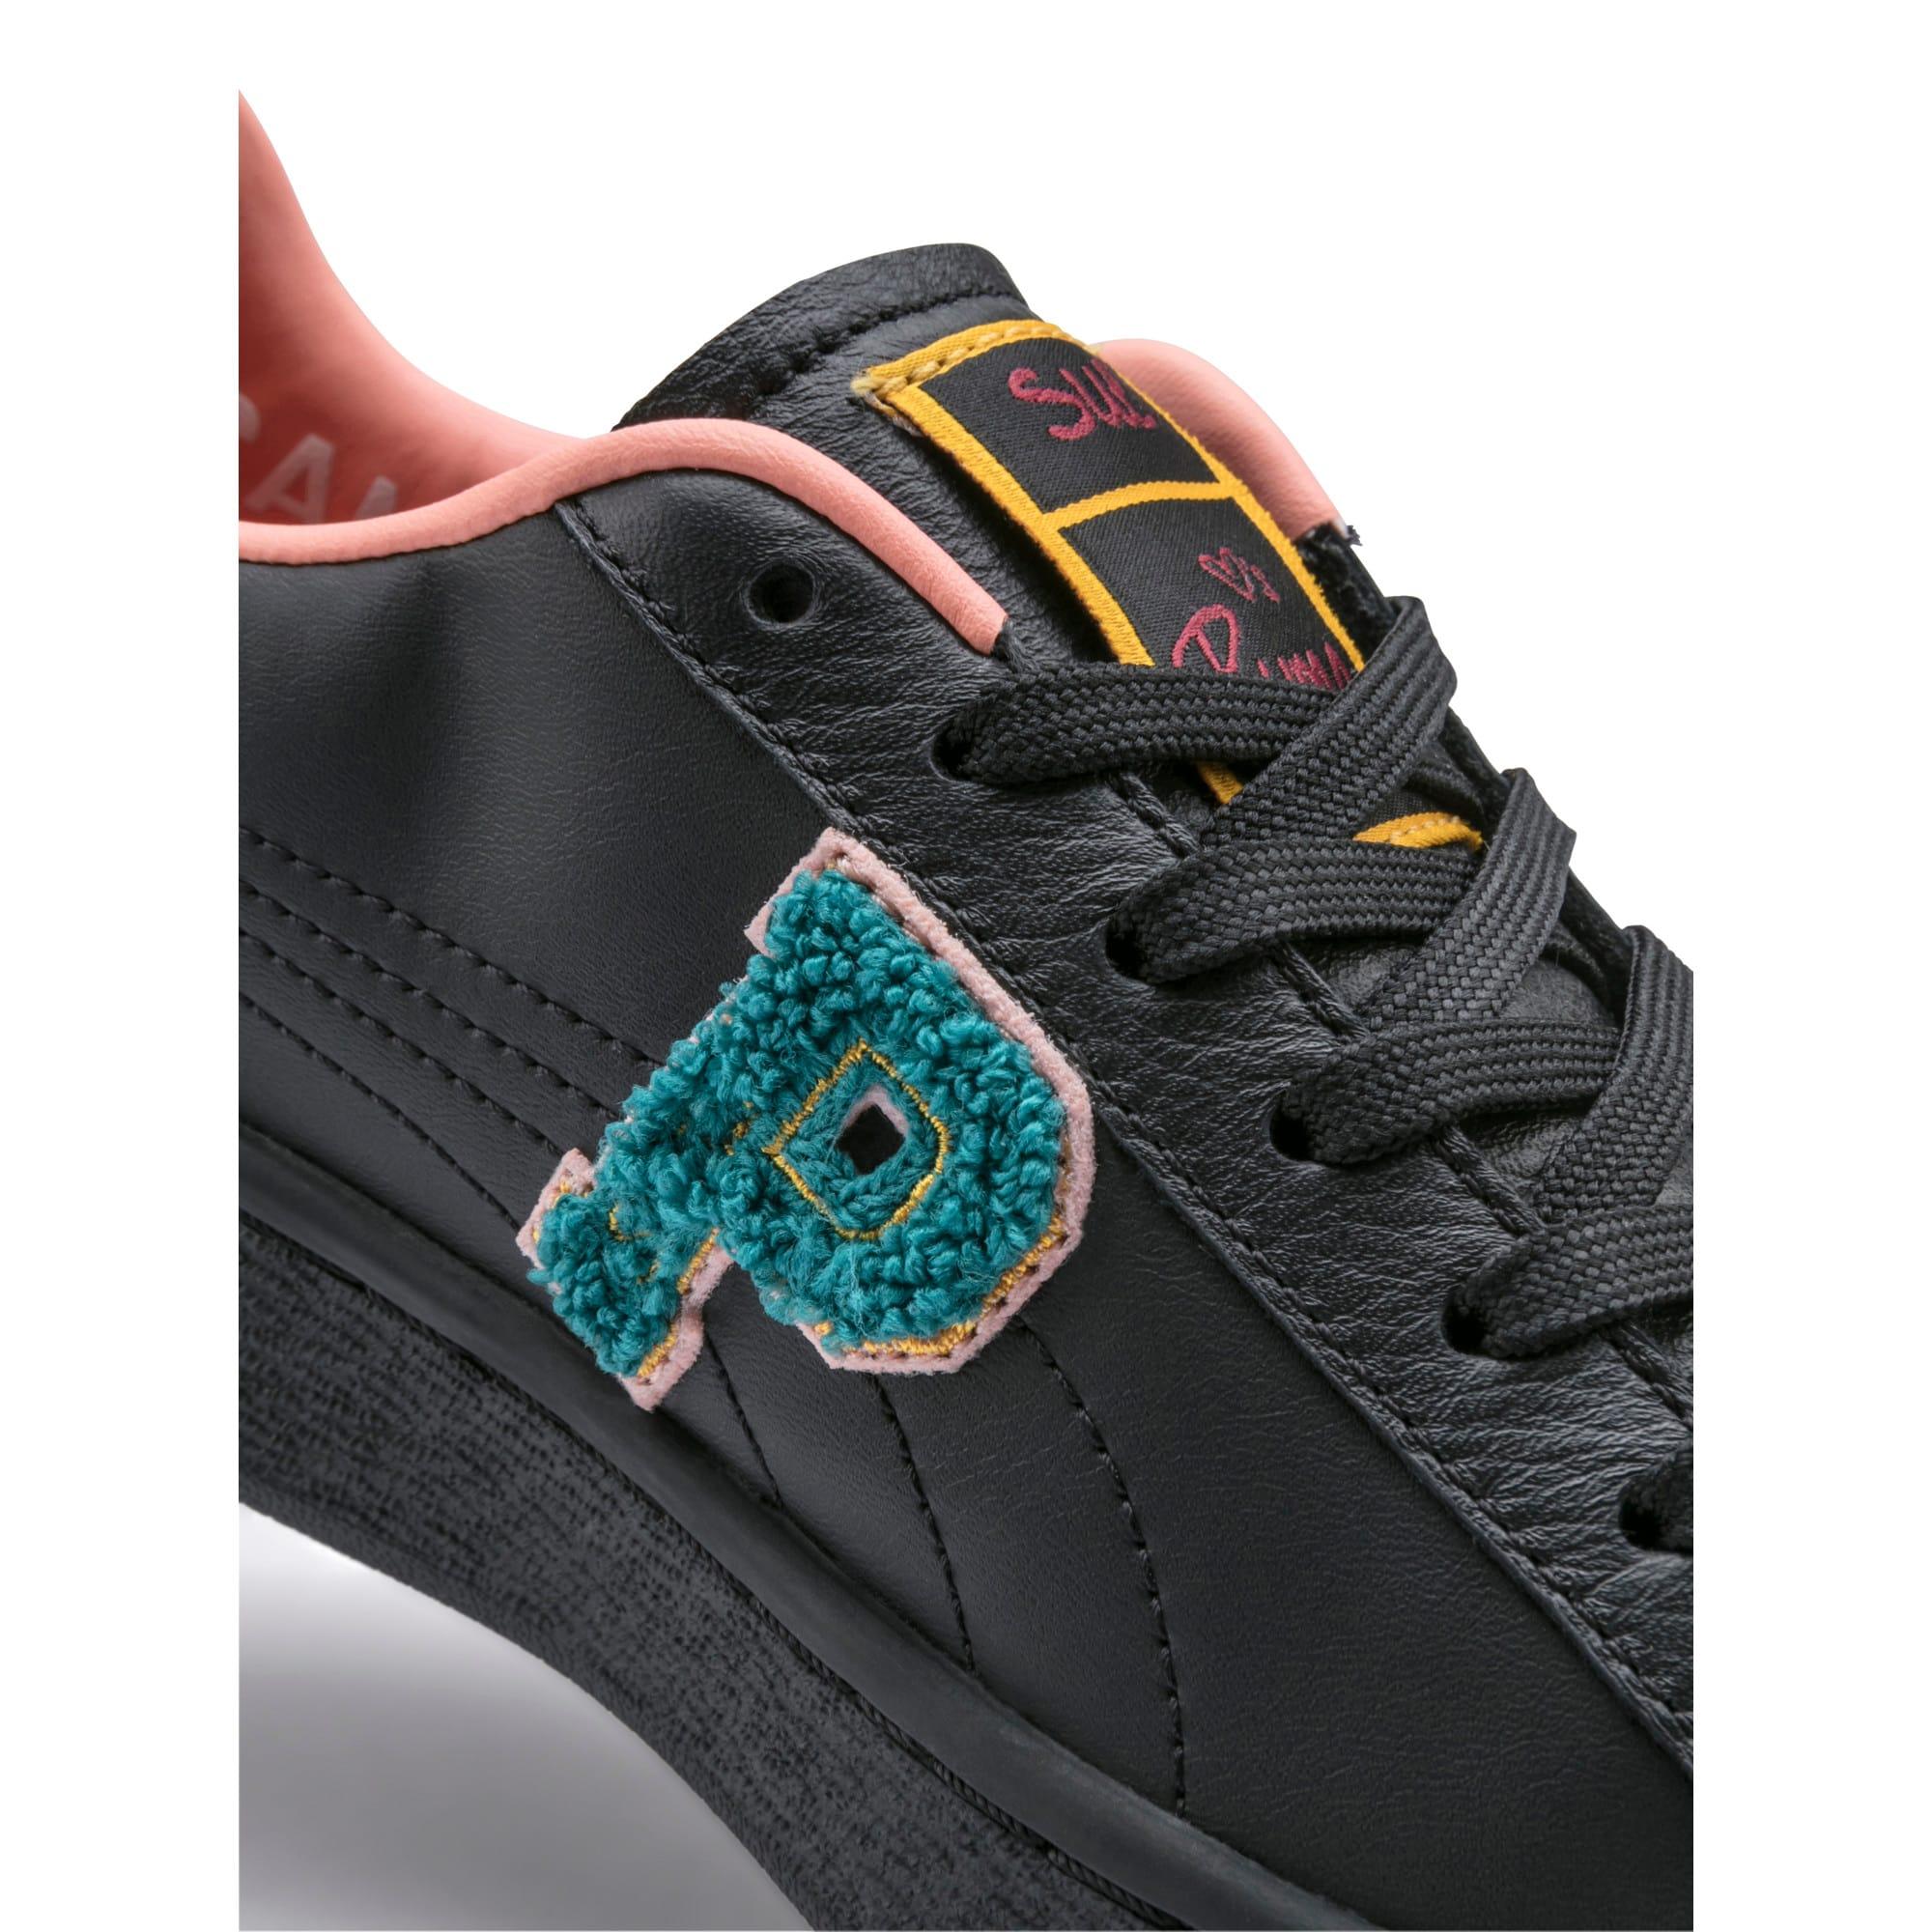 Thumbnail 7 of PUMA x SUE TSAI Basket Women's Sneakers, Puma Black, medium